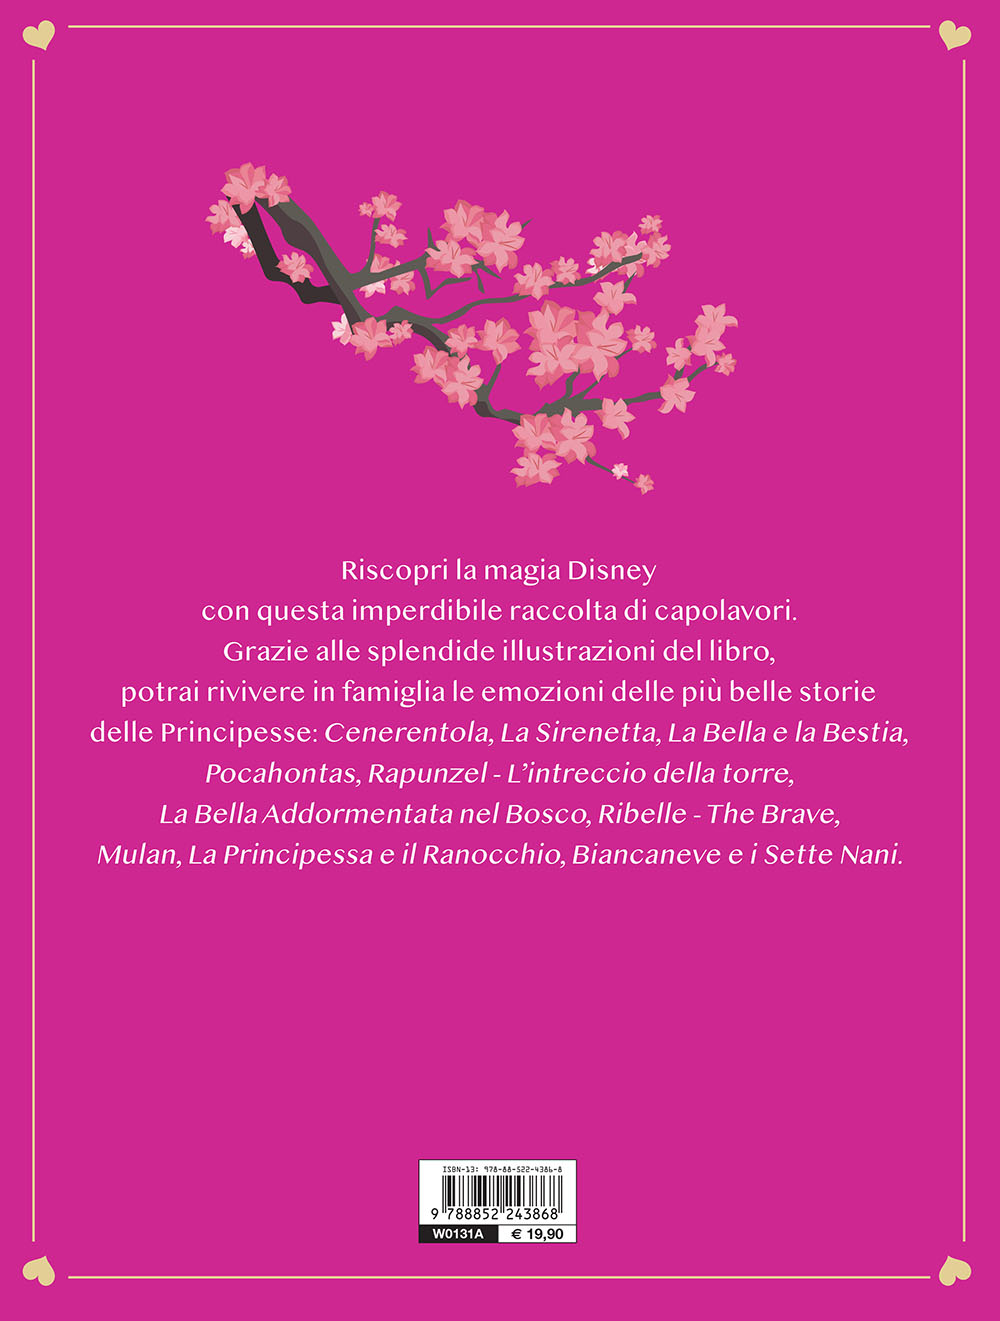 Storie di Principesse - Disney Princess